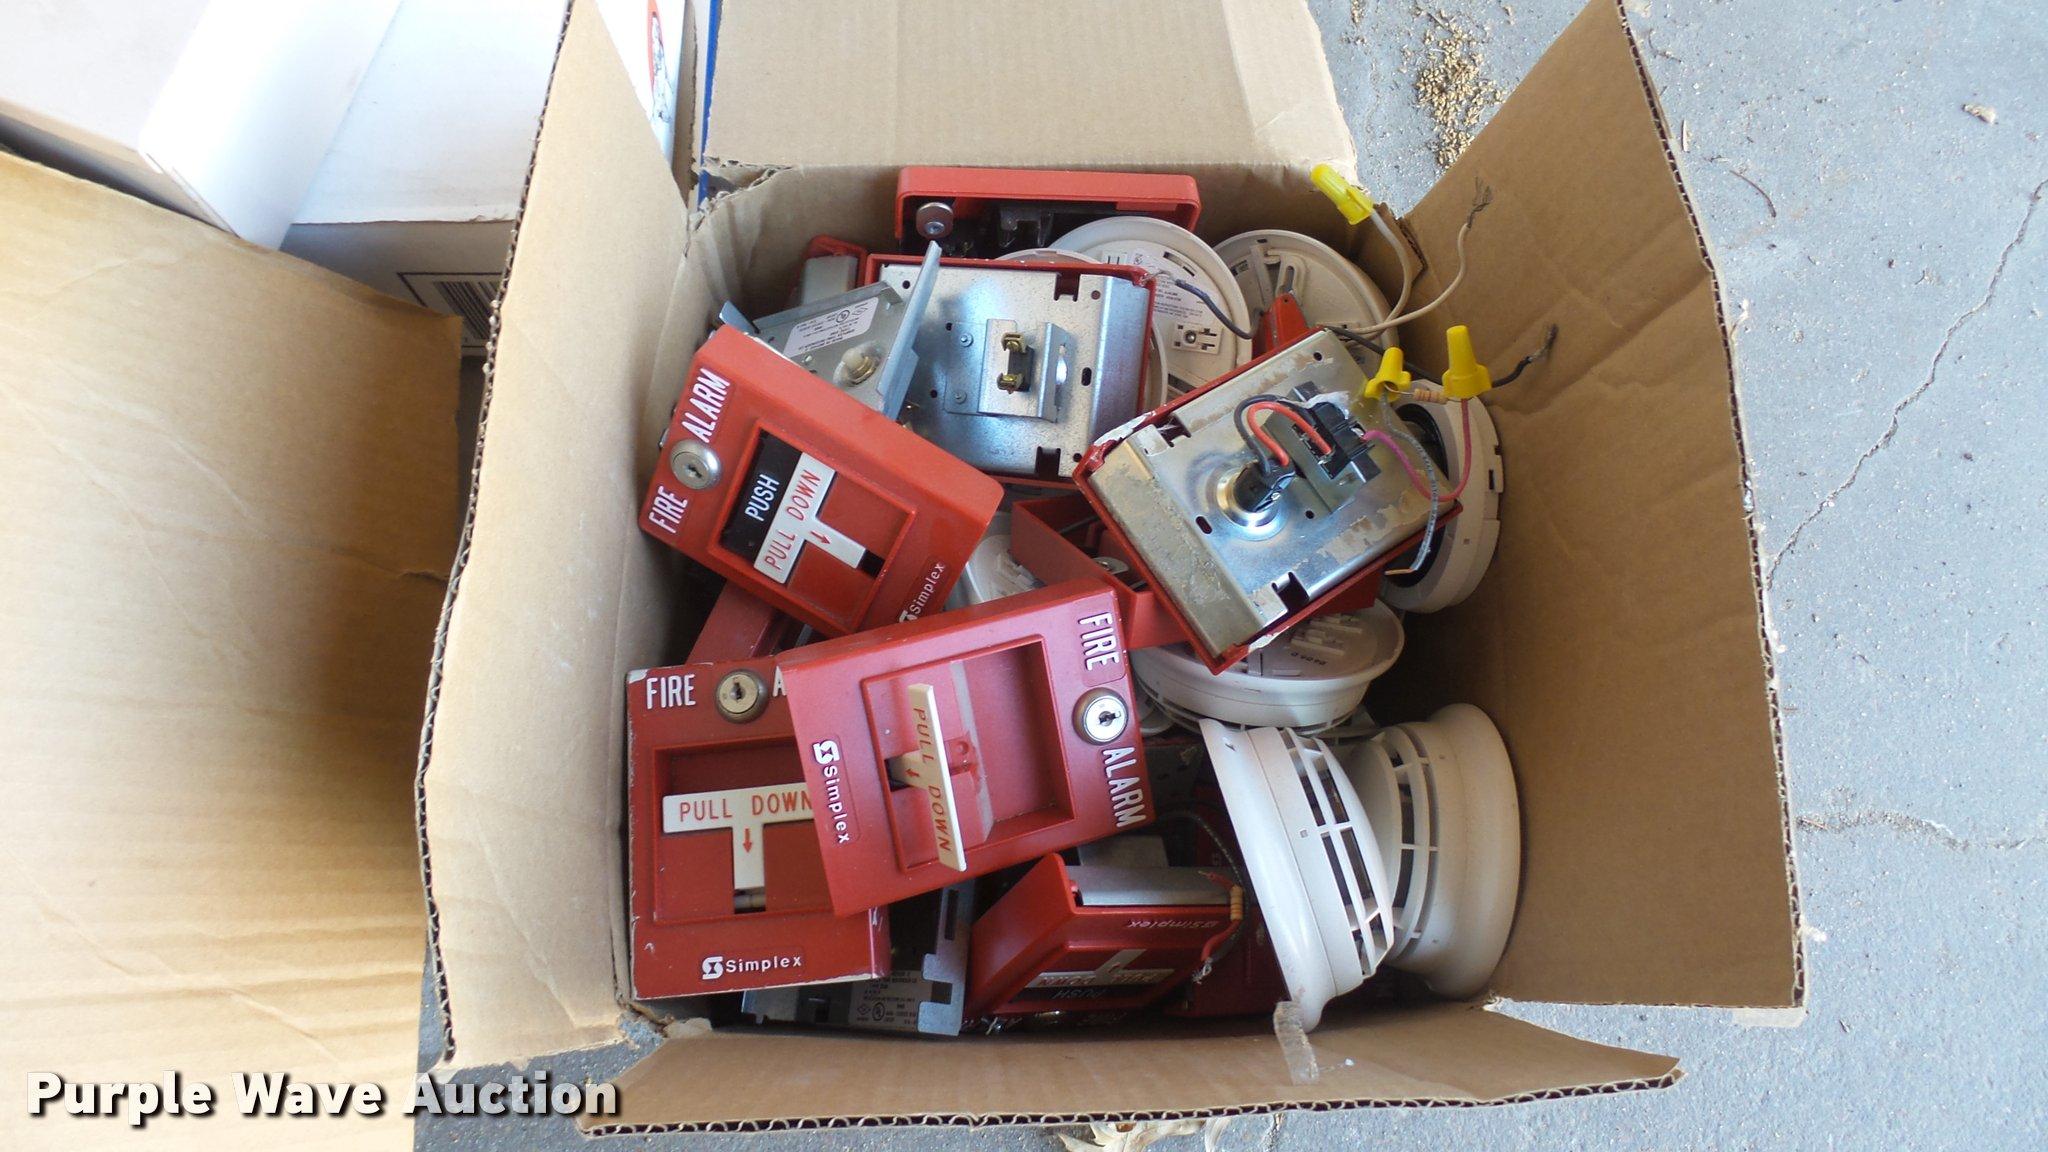 Simplex fire alarm system | Item DQ9772 | SOLD! April 4 Gove